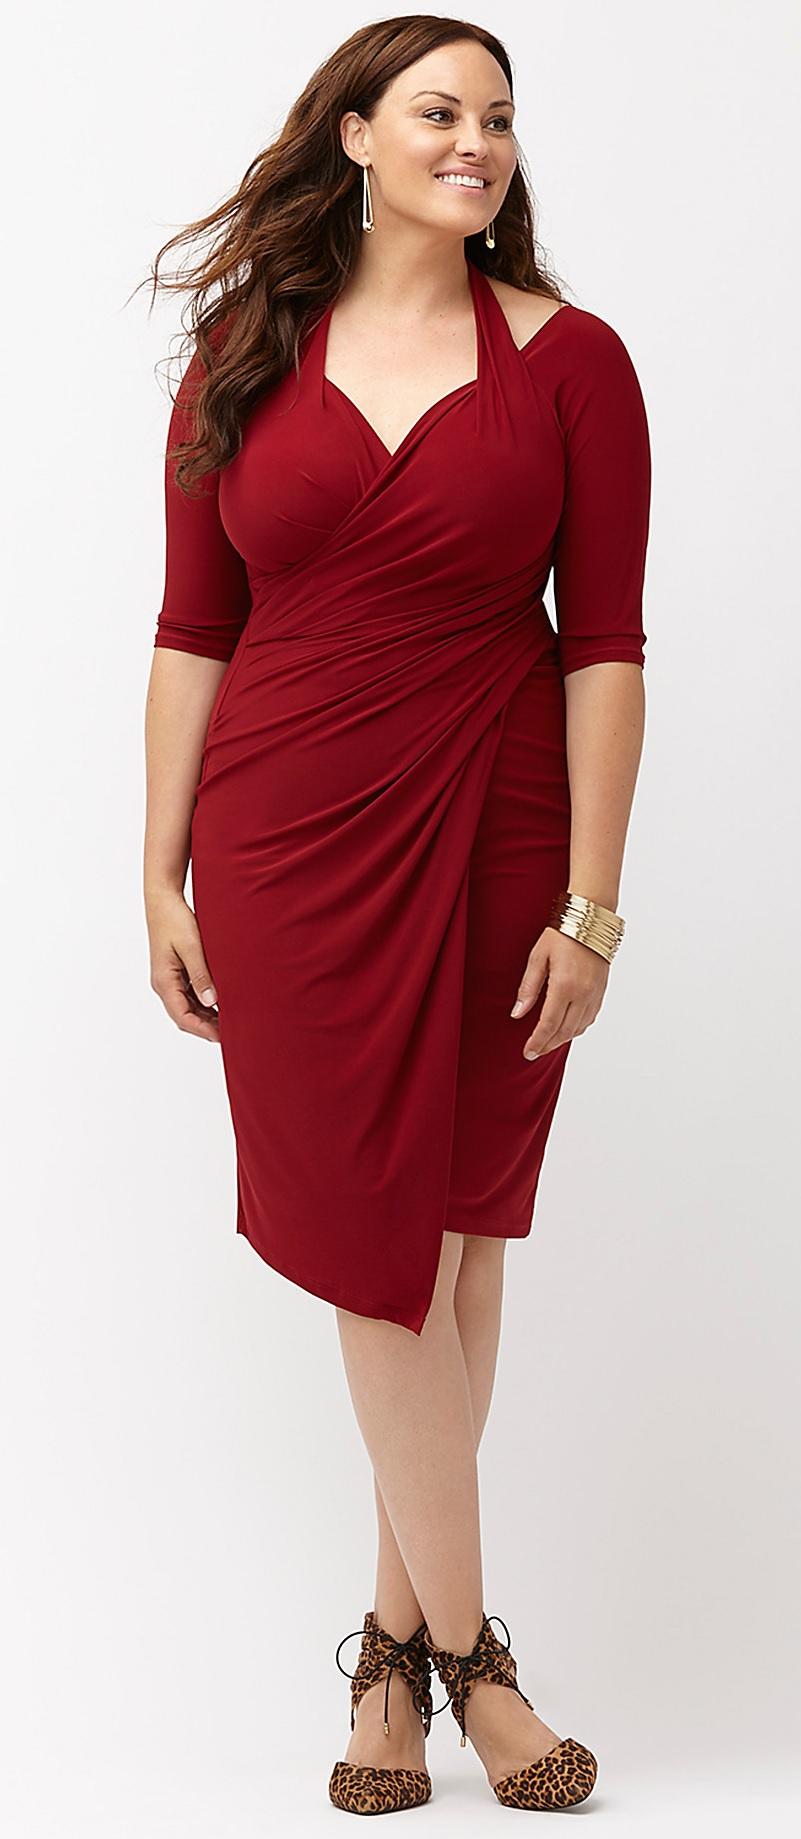 plus-size-valentines-day-red-dresses-2 - Alexa Webb